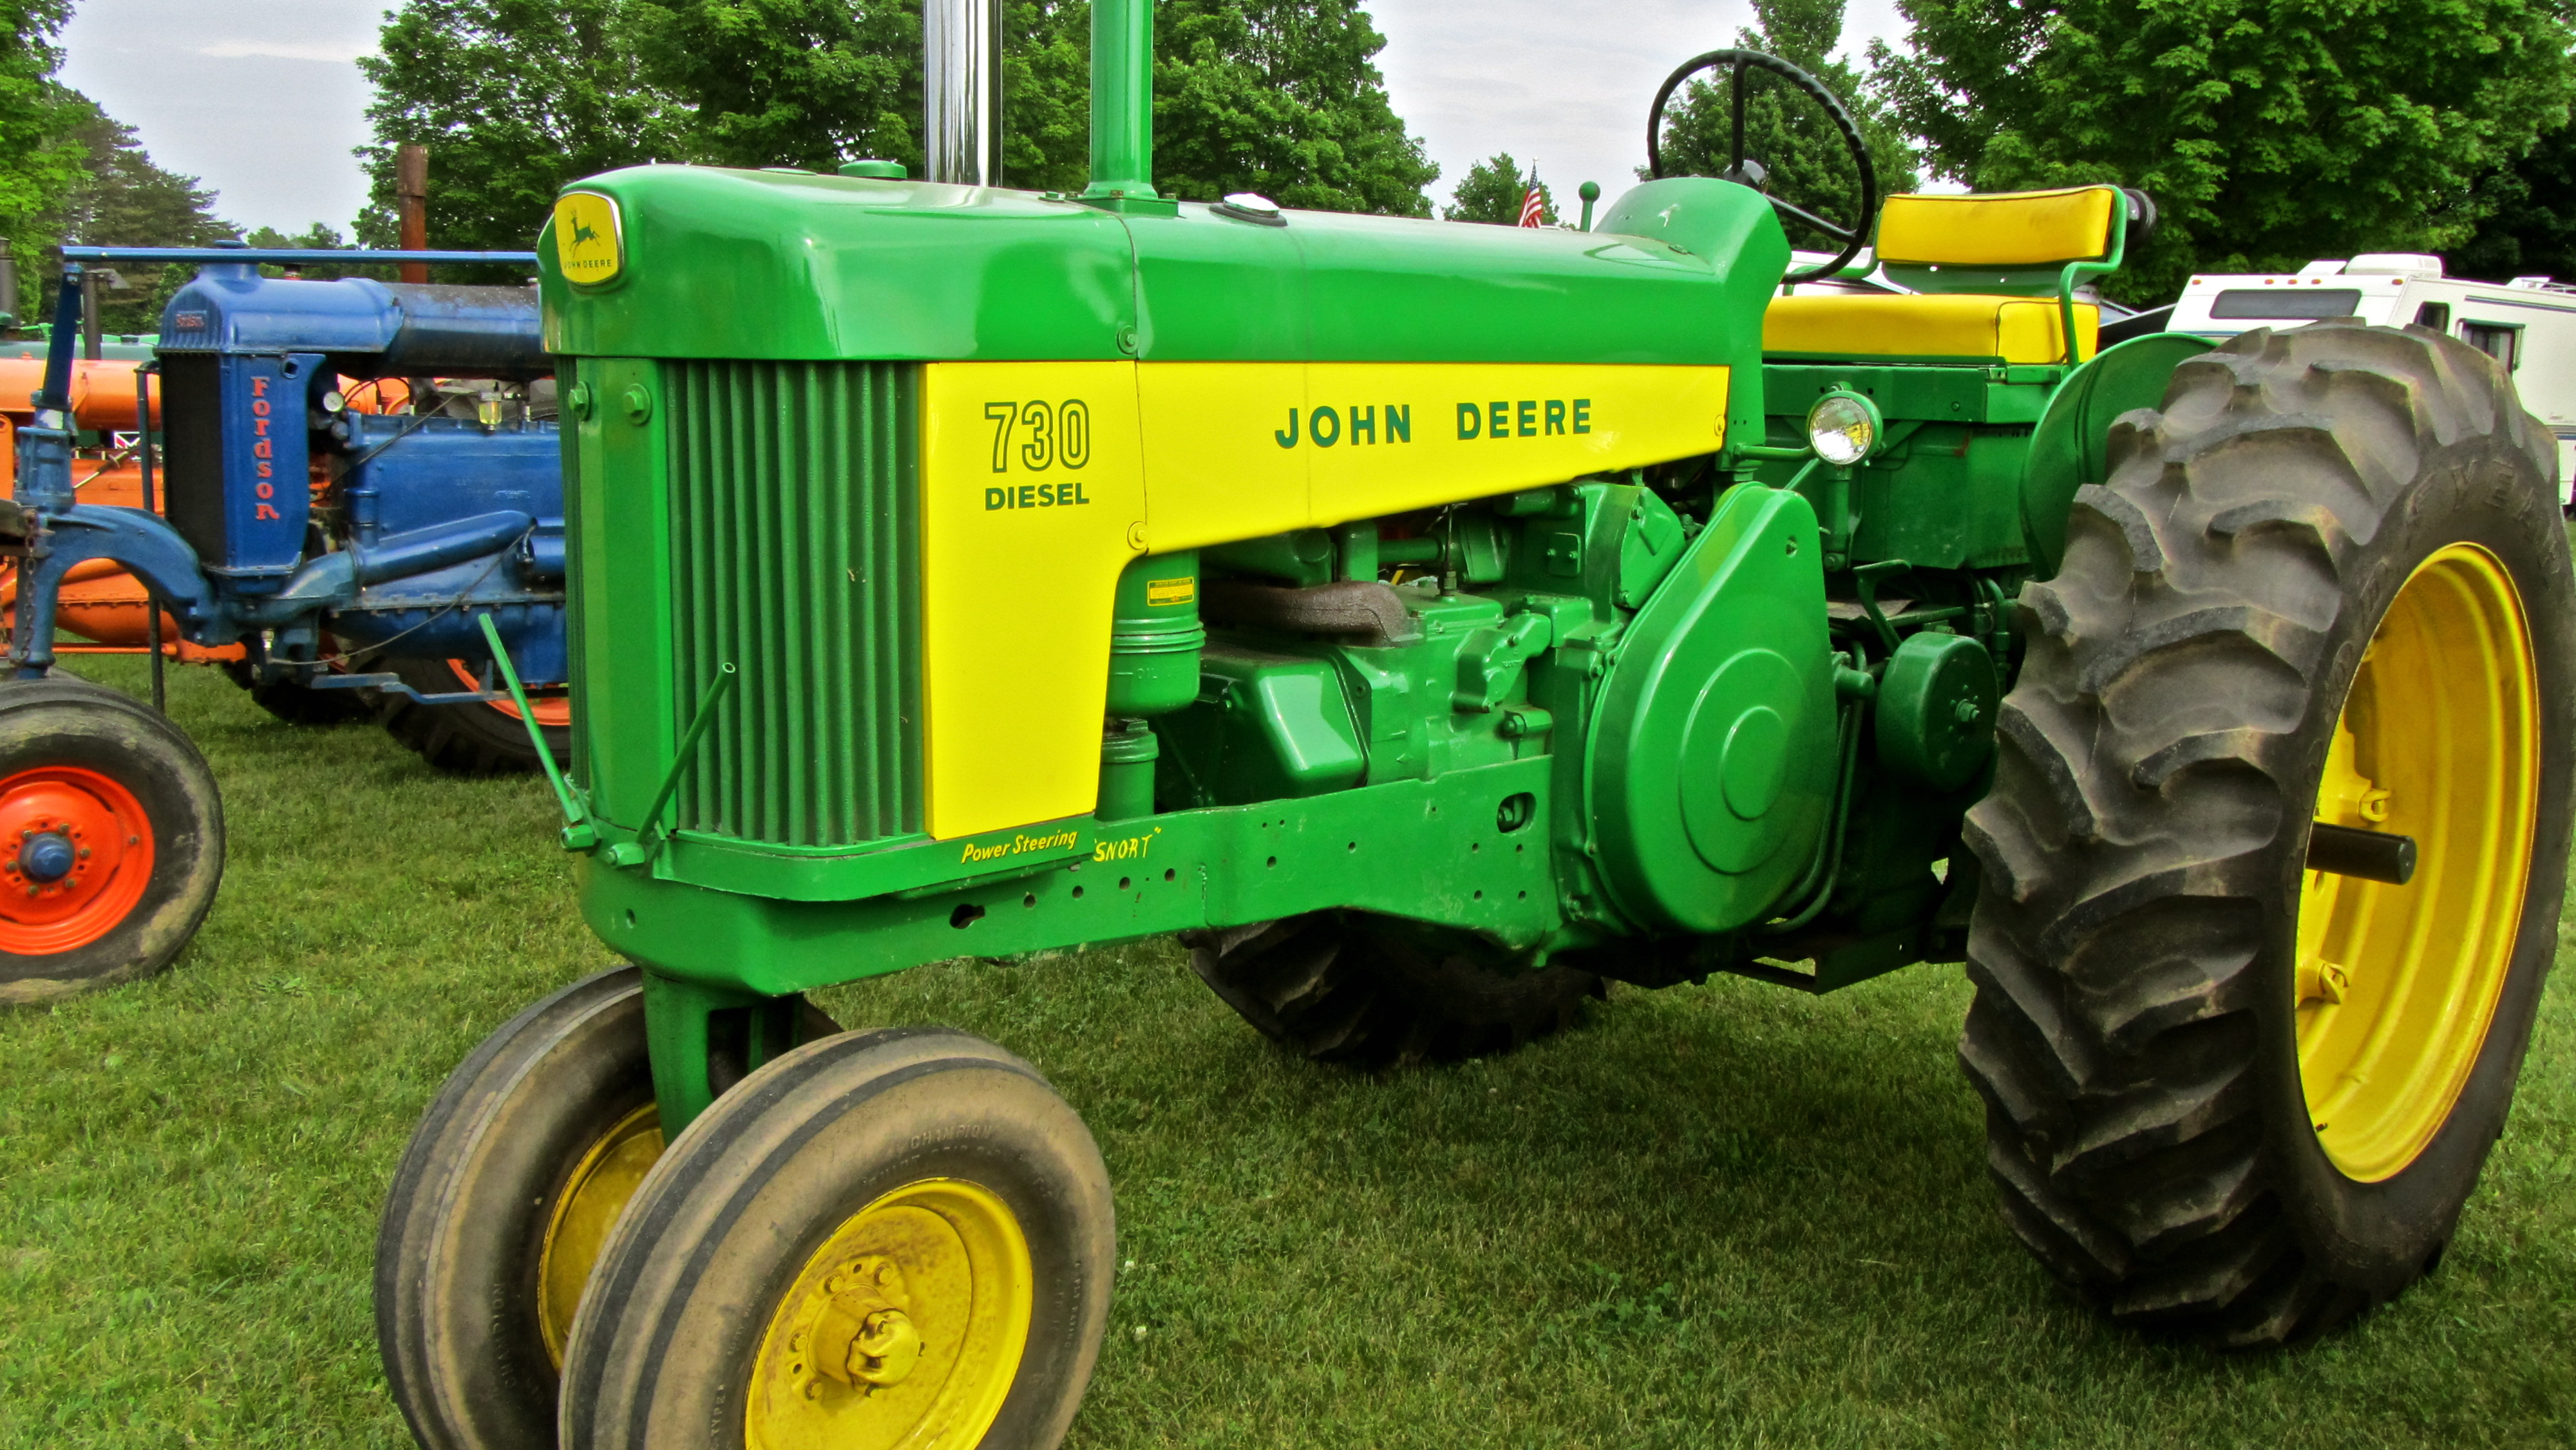 File:John Deere 730 Diesel Tractor.jpg - Wikimedia Commons